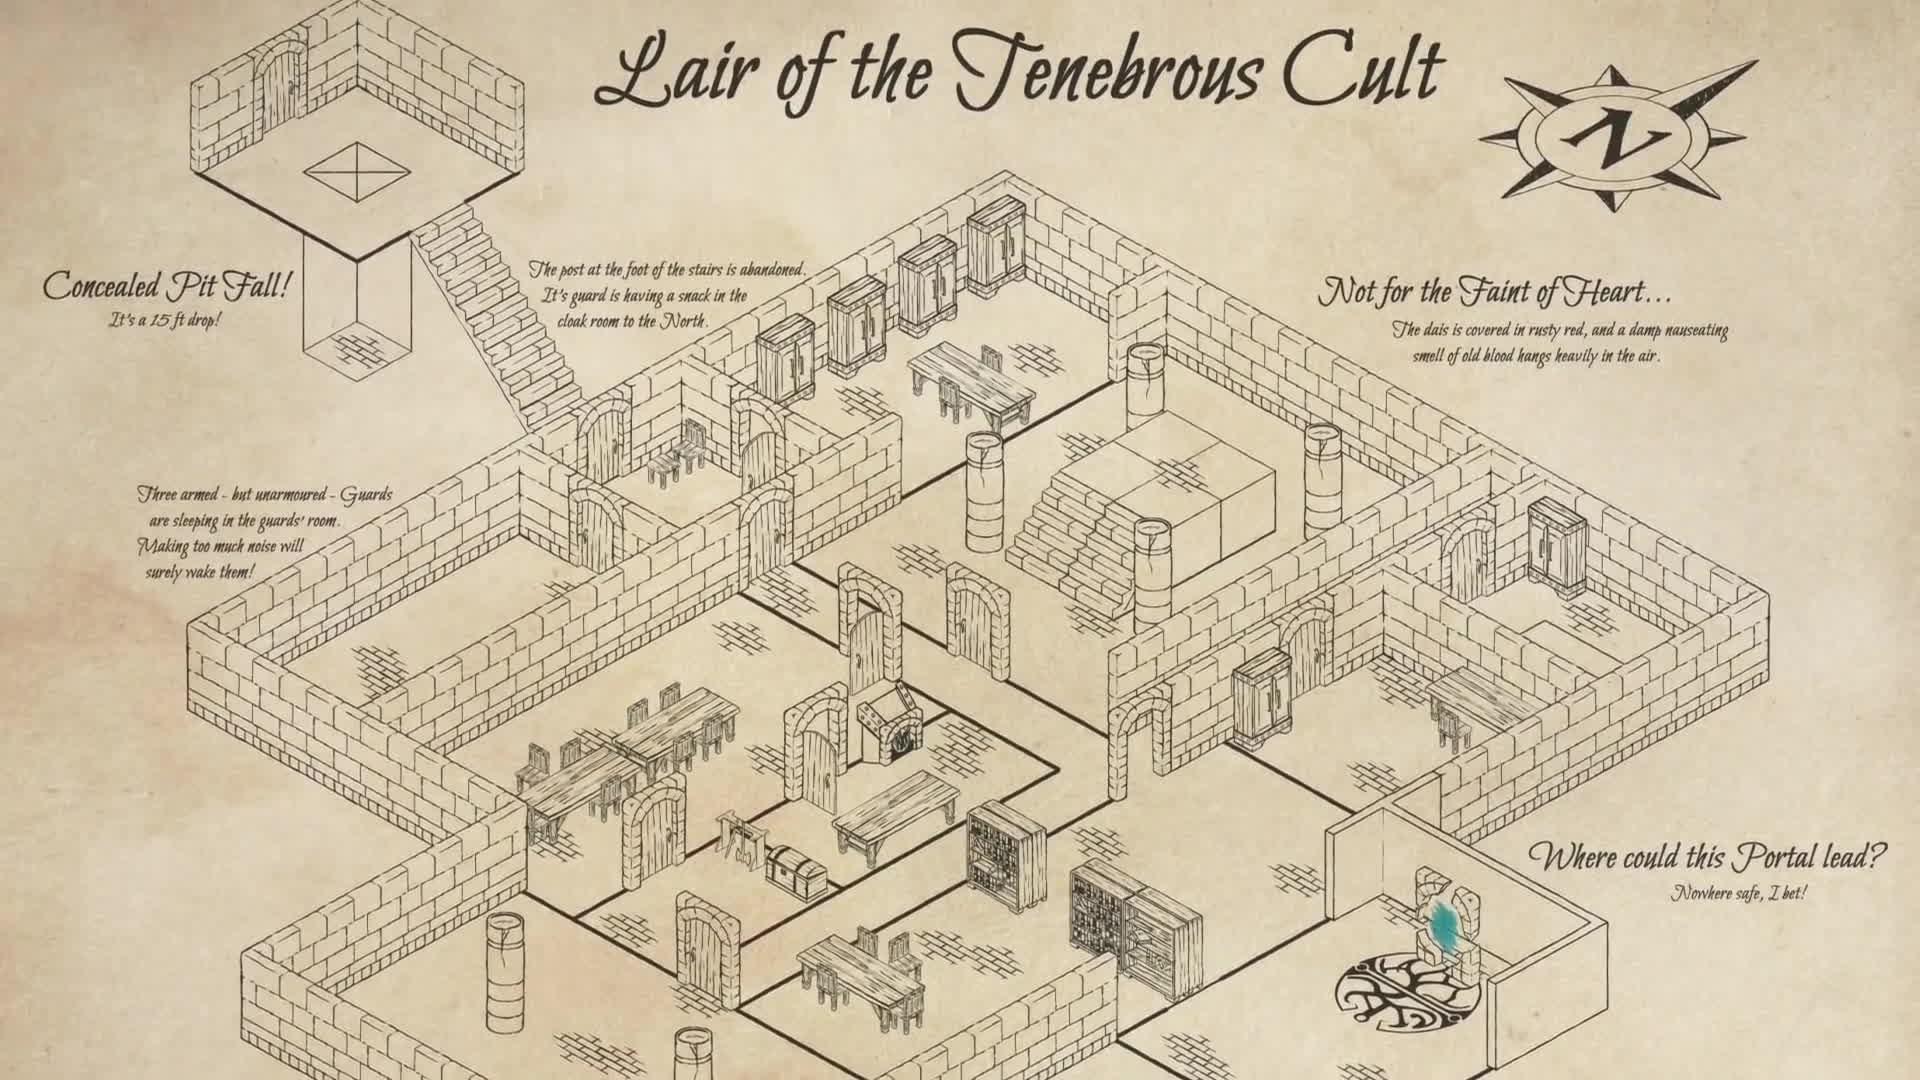 dungeon builder, isometric, map maker, Dungeon Builder Kickstarter Video GIFs